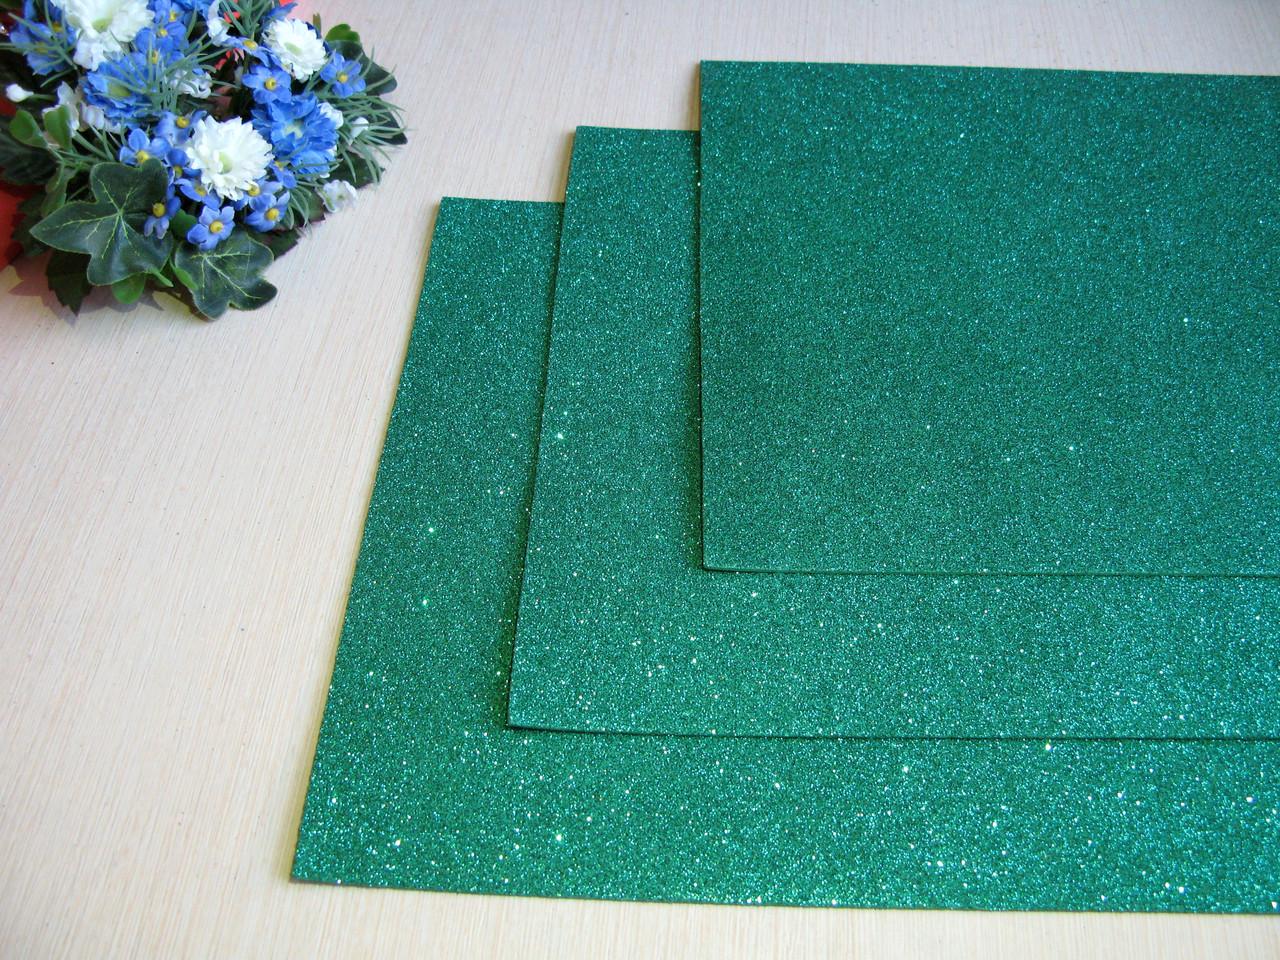 Глиттерный фоамиран 2 мм, р-р 20 на 30 см. Зеленый  7 грн - 1 шт.